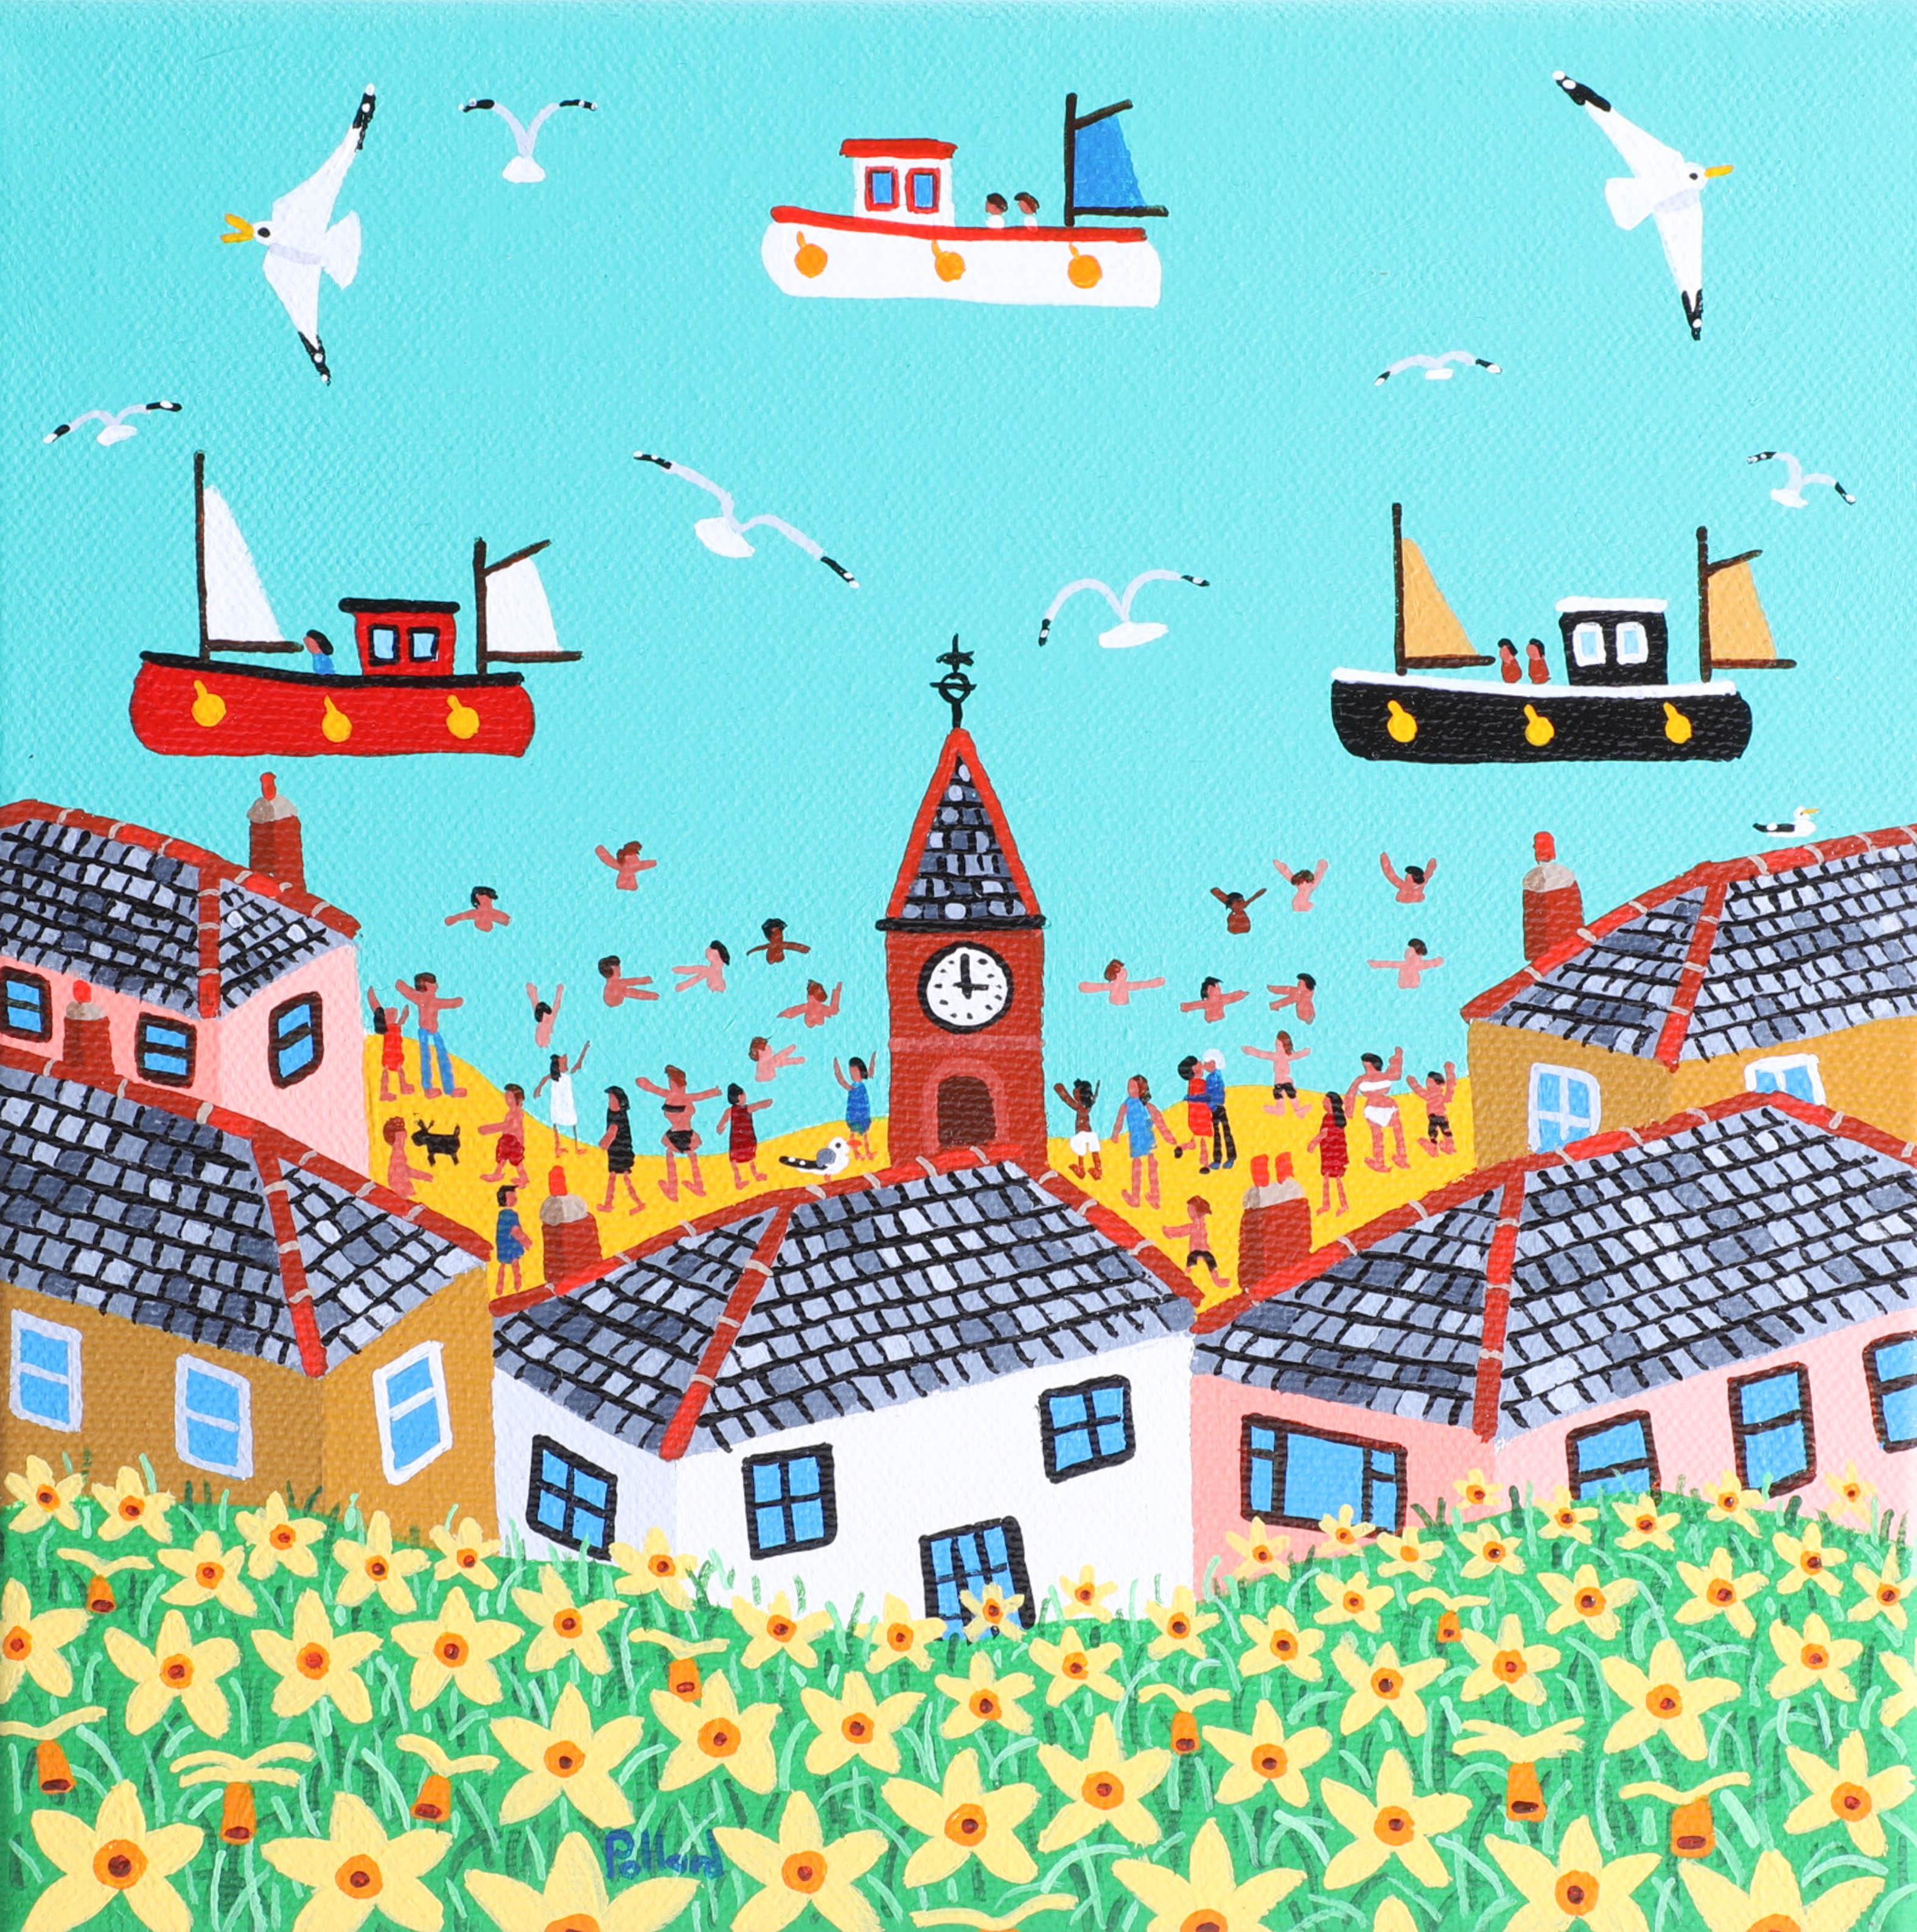 Lot 021 - Brian Pollard, acrylic on canvas, 'Springtime, Kingsand', signed, 20cm x 20cm. Brian Pollard is